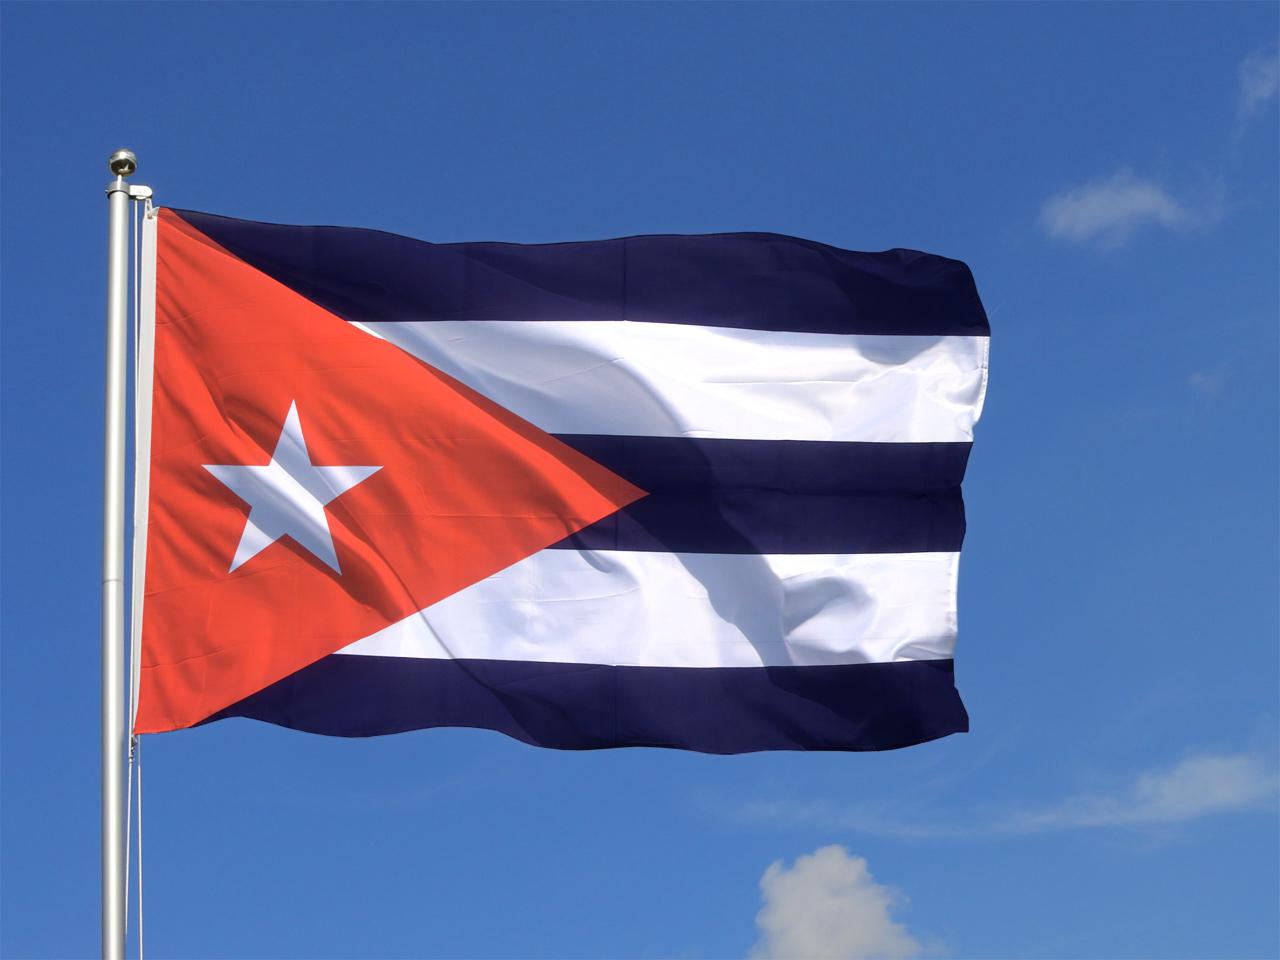 Gro e kuba flagge 150 x 250 cm Kuba dekoration